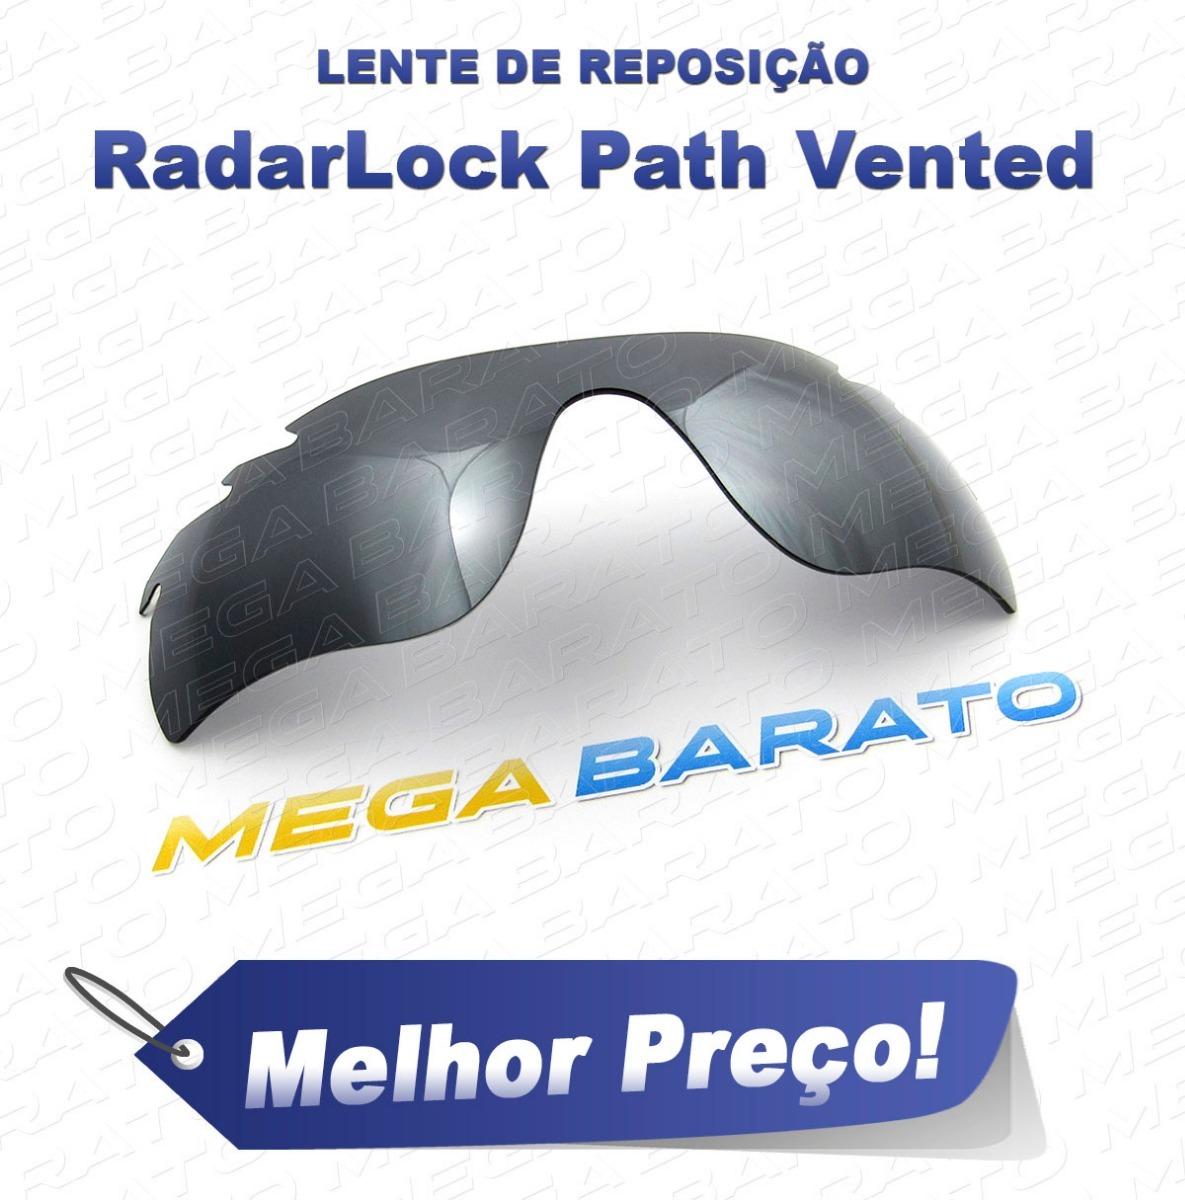 bd0f15bf1 Lente Óculos Radarlock Path Vented Stealth Black Polarizada - R$ 110 ...